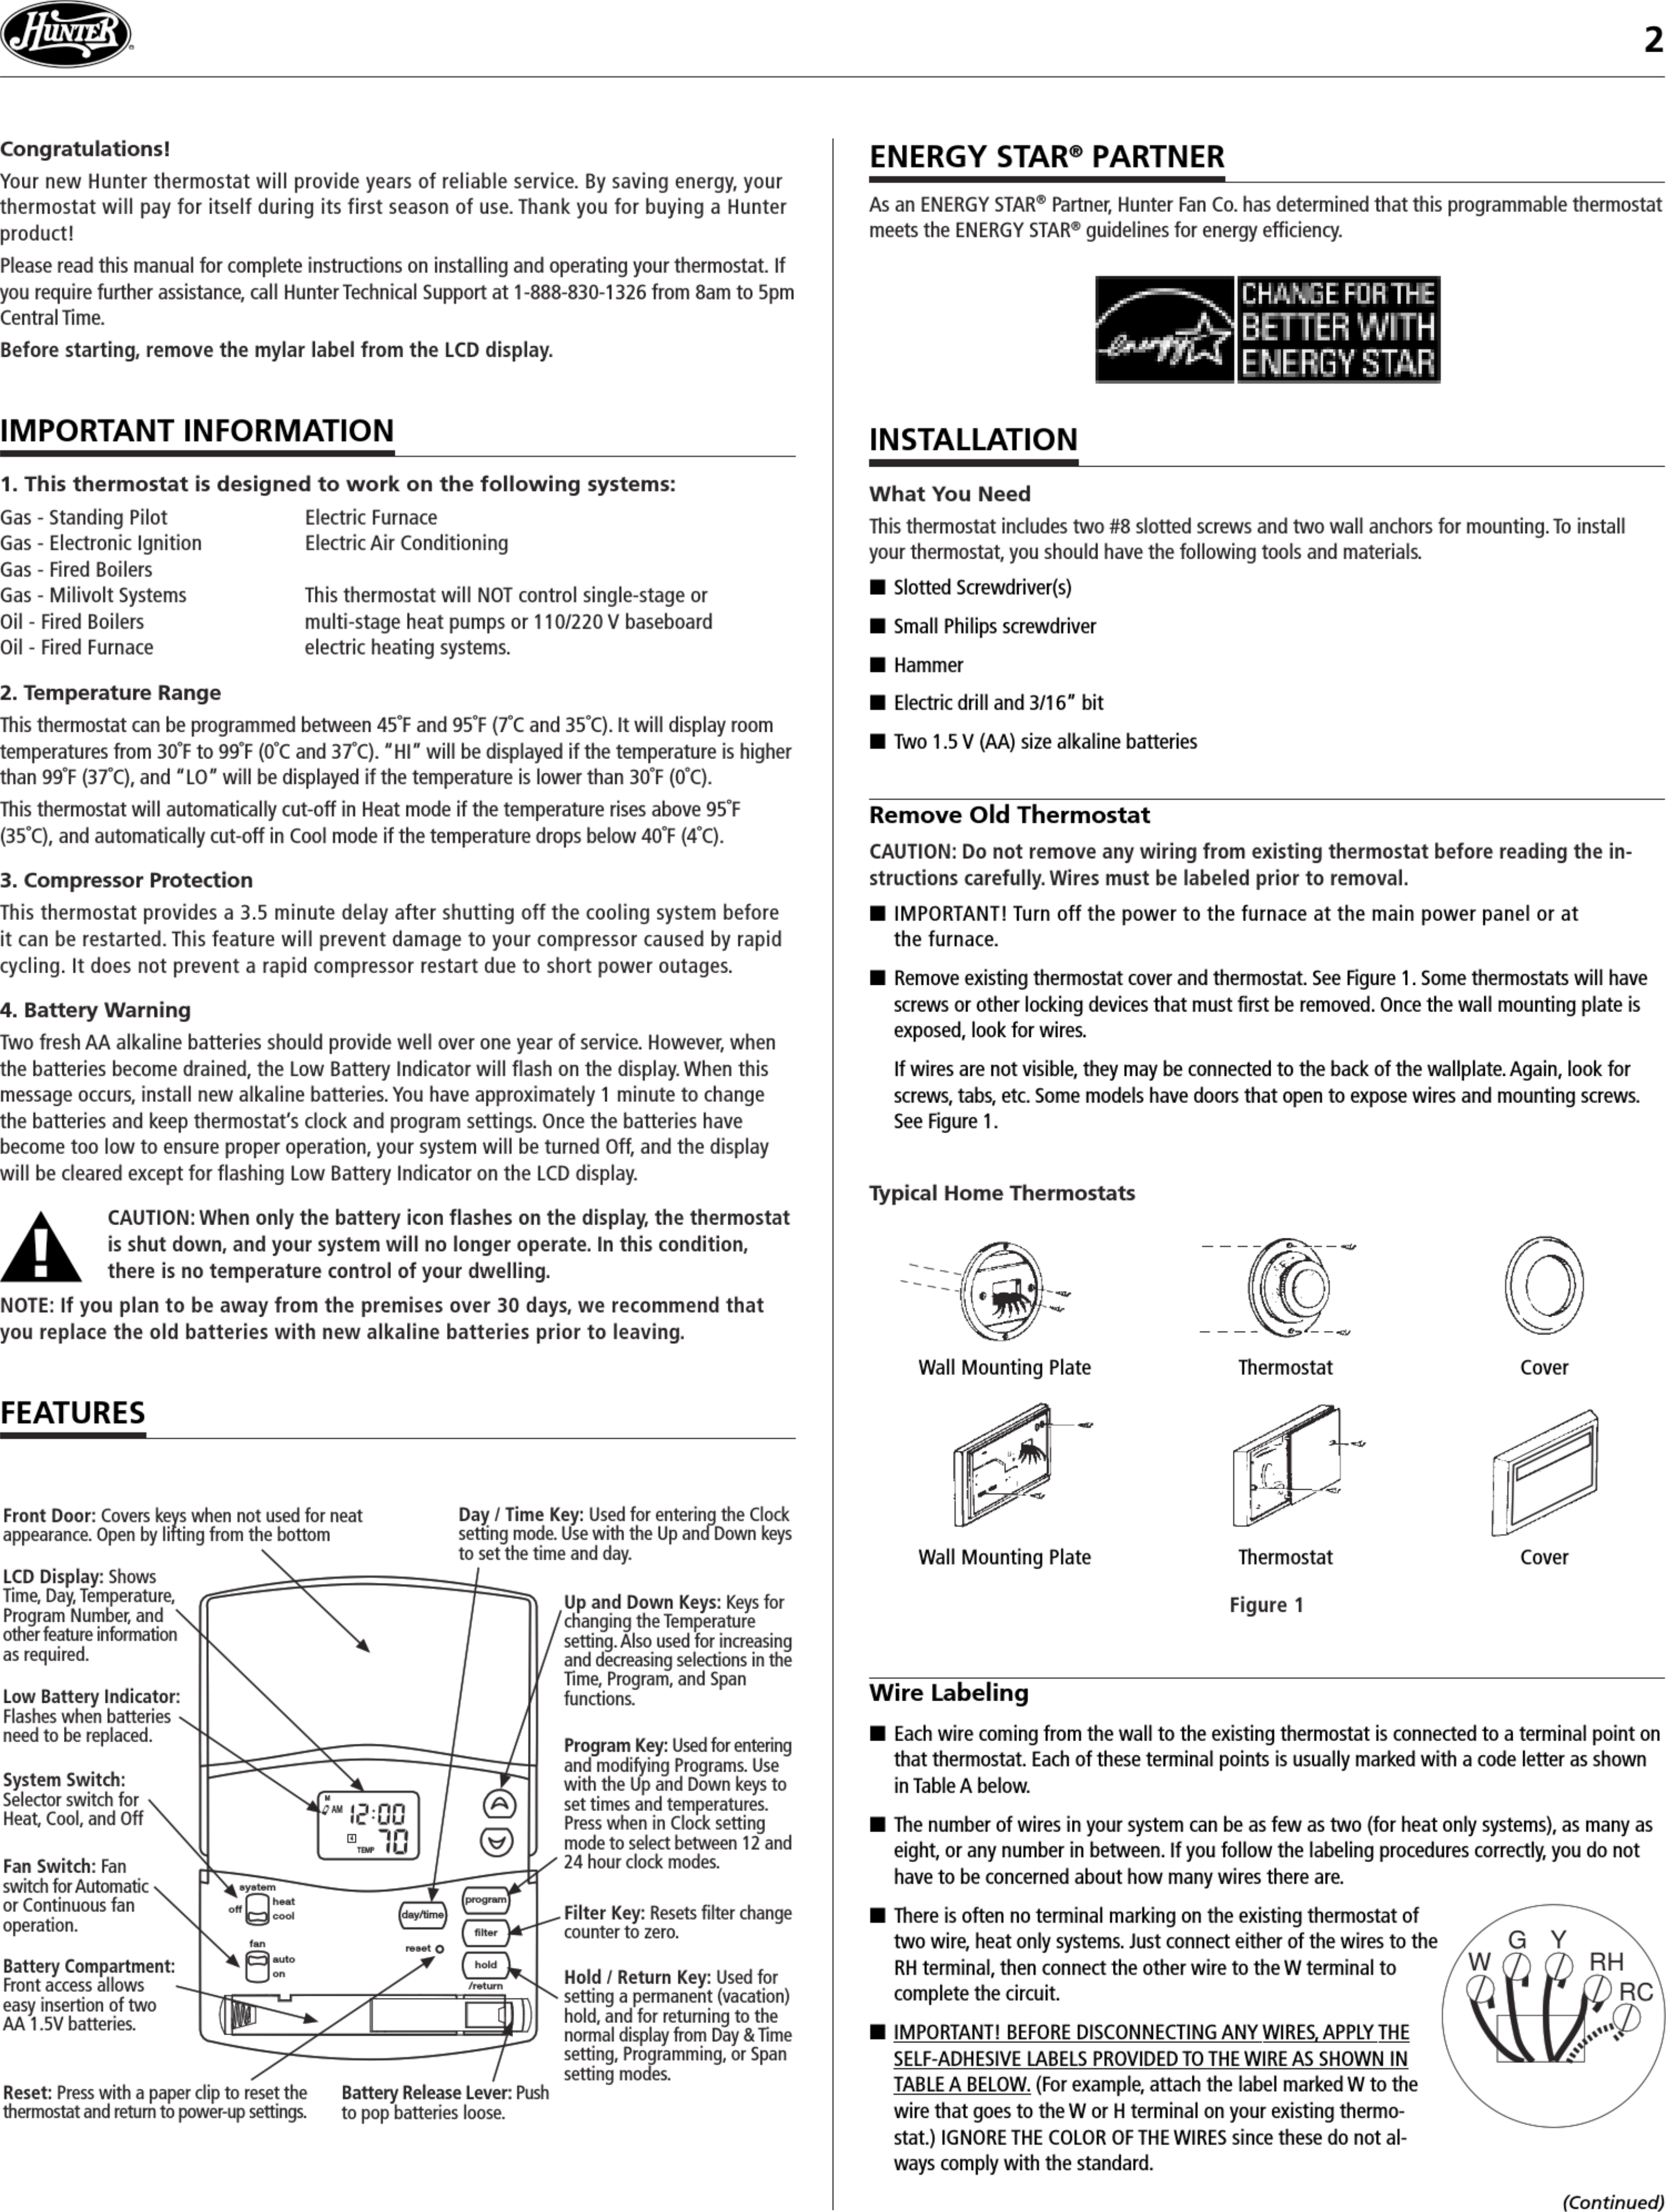 Großzügig Hunter Thermostat Schaltplan 44377 Fotos - Schaltplan ...